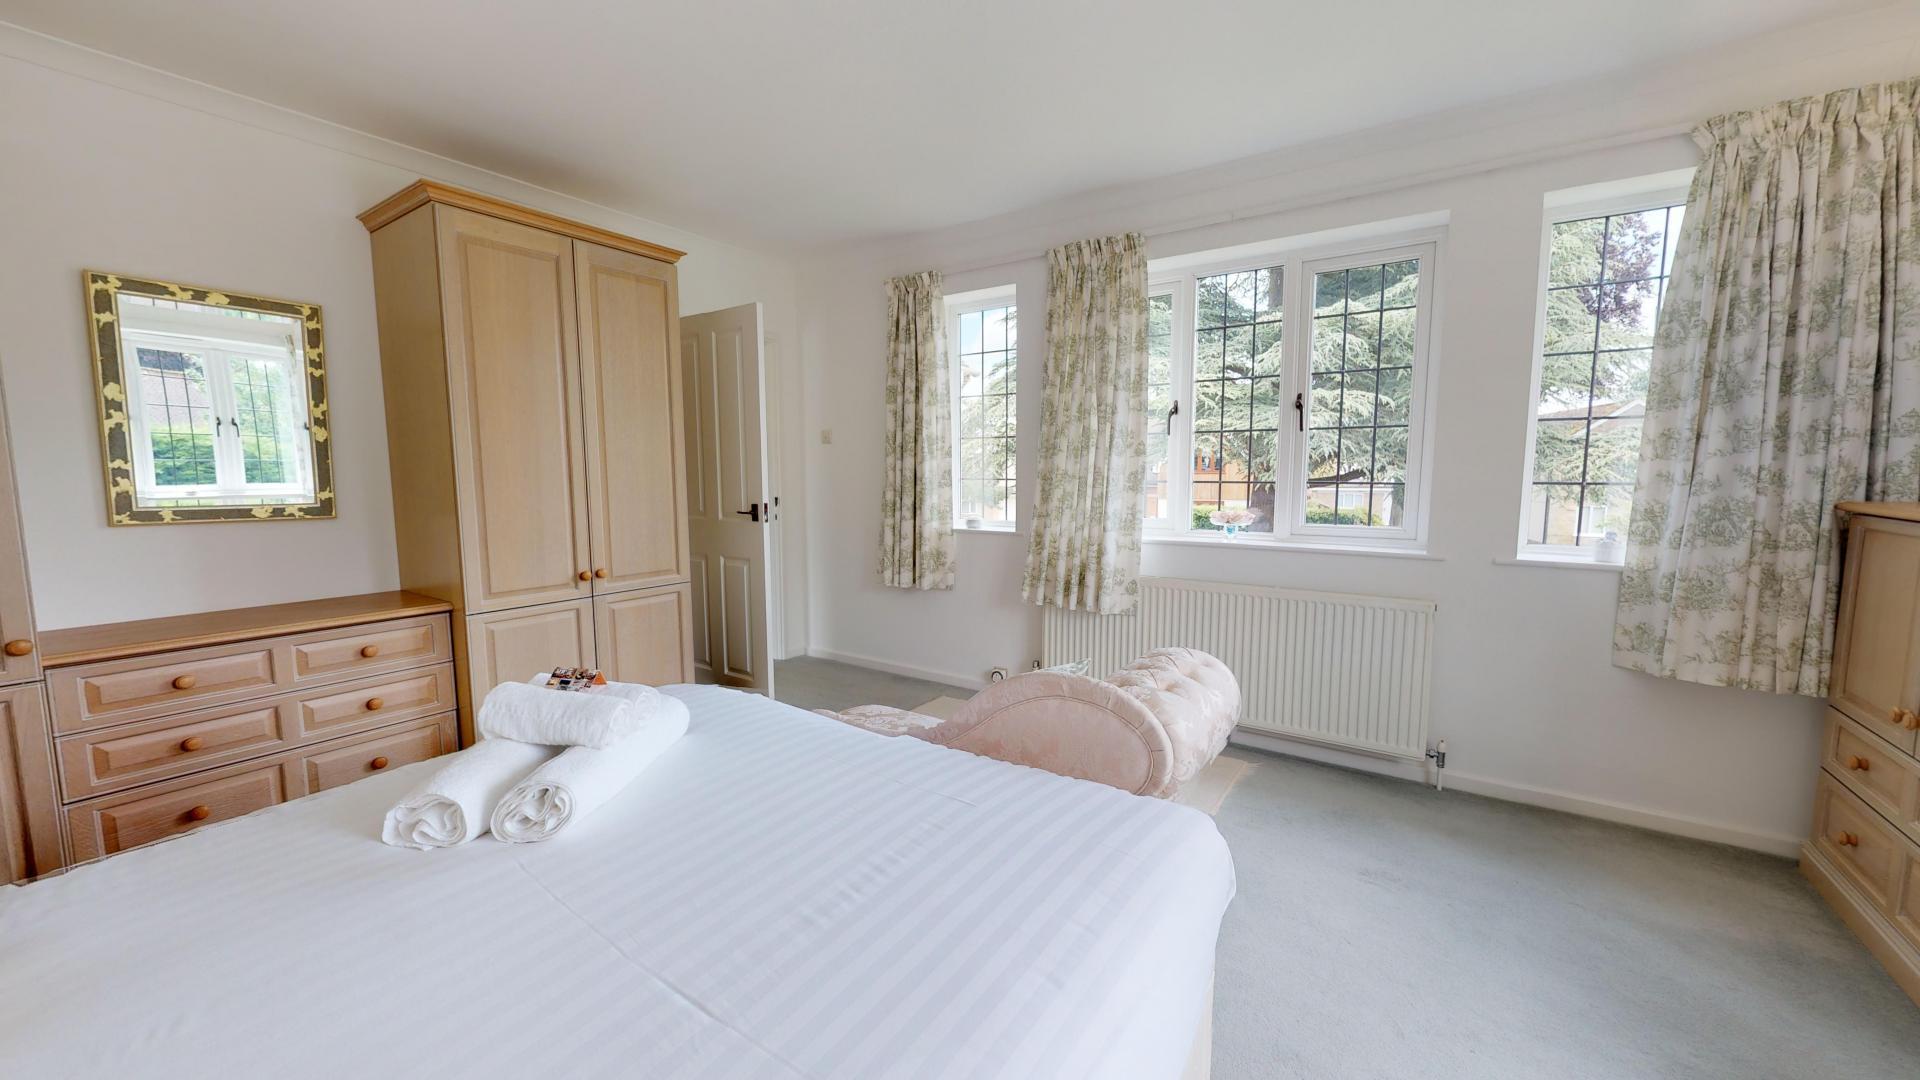 Bed 1 at Blenheim Gate House, Centre, Woodstock